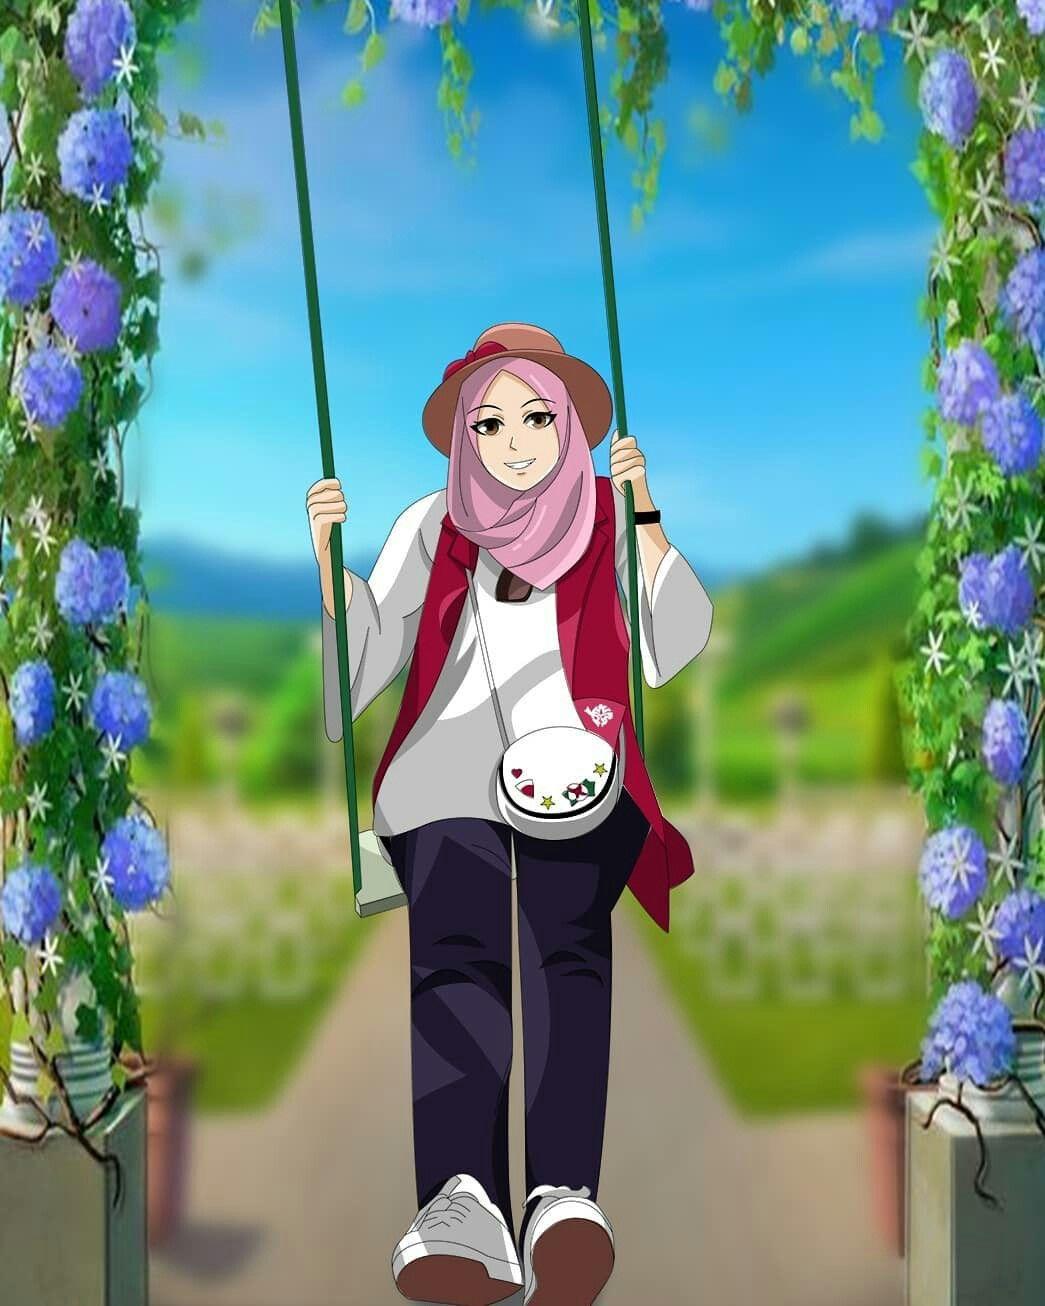 Pin Oleh Diah Setiani Di Anime Kartun Muslimah